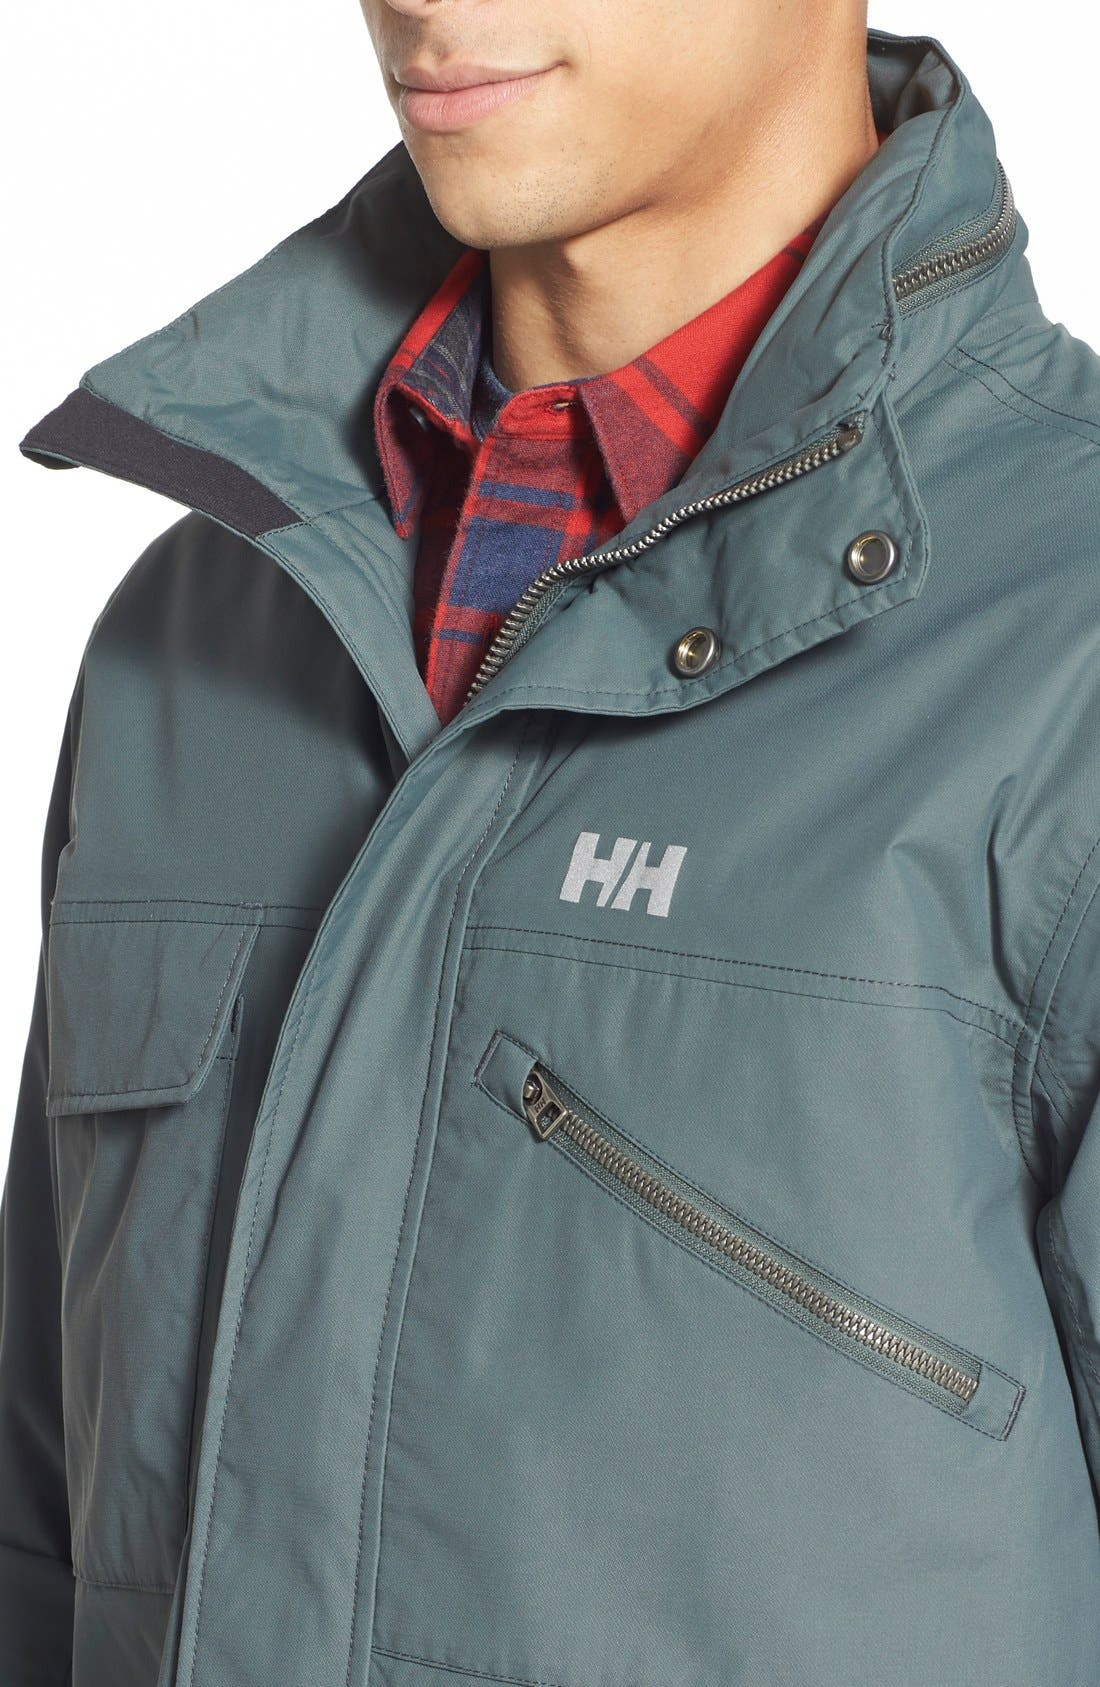 HellyHansen 'Universal' MotoRain Jacket,                             Alternate thumbnail 9, color,                             080